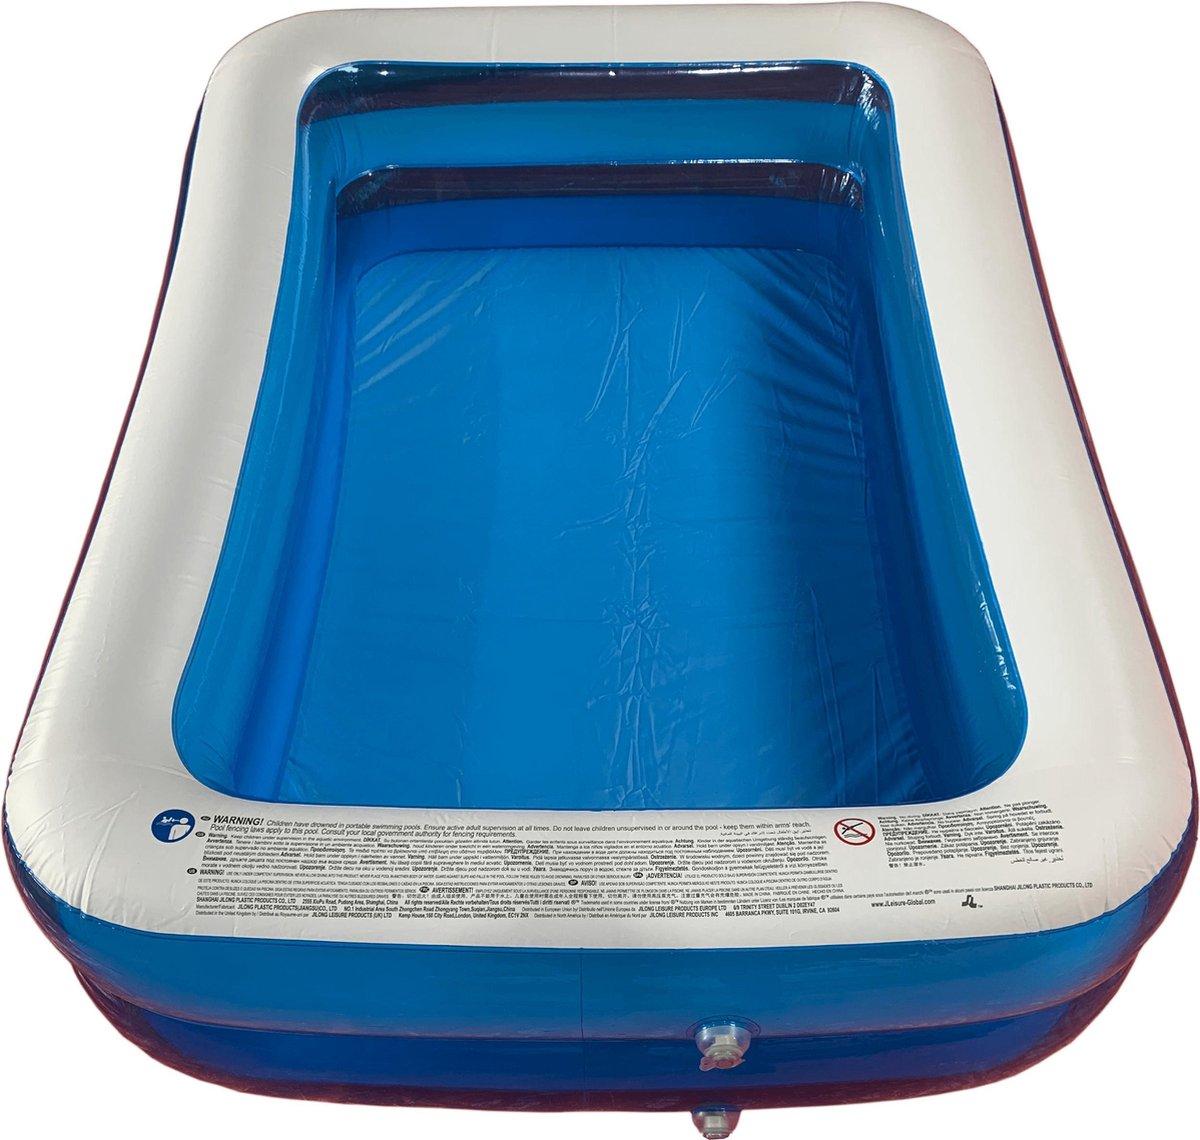 Opblaasbaar Zwembad Rechthoekig Blauw - 200x150x50